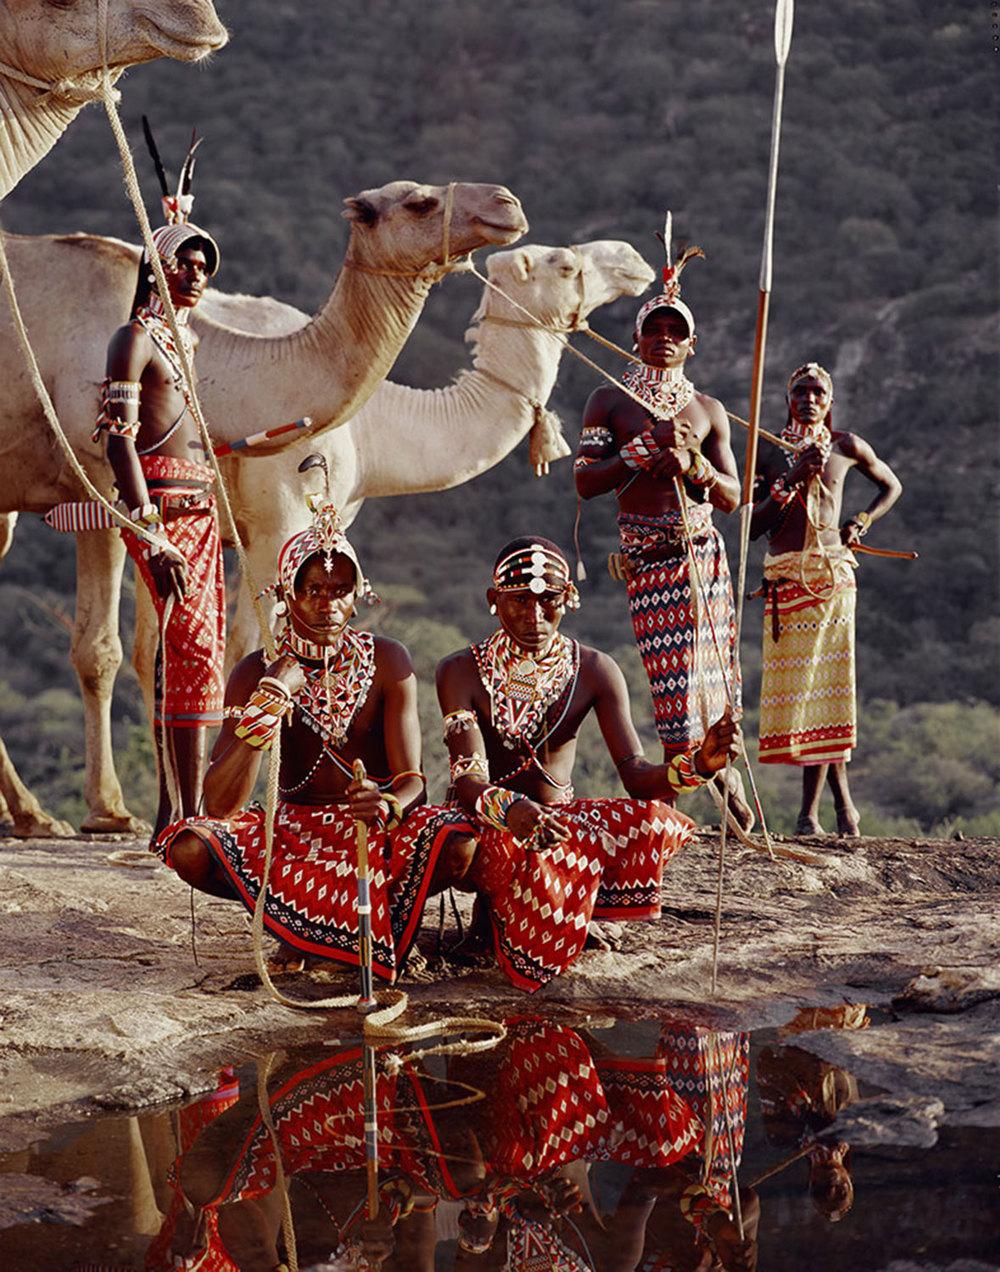 jimmy nelson // XV11, LELESAS, LOUELEN, LEWANGU, LEPOKODOU, LOINGU, NYERE NDOTO MOUNTAIN RANGE KENYA, 2010